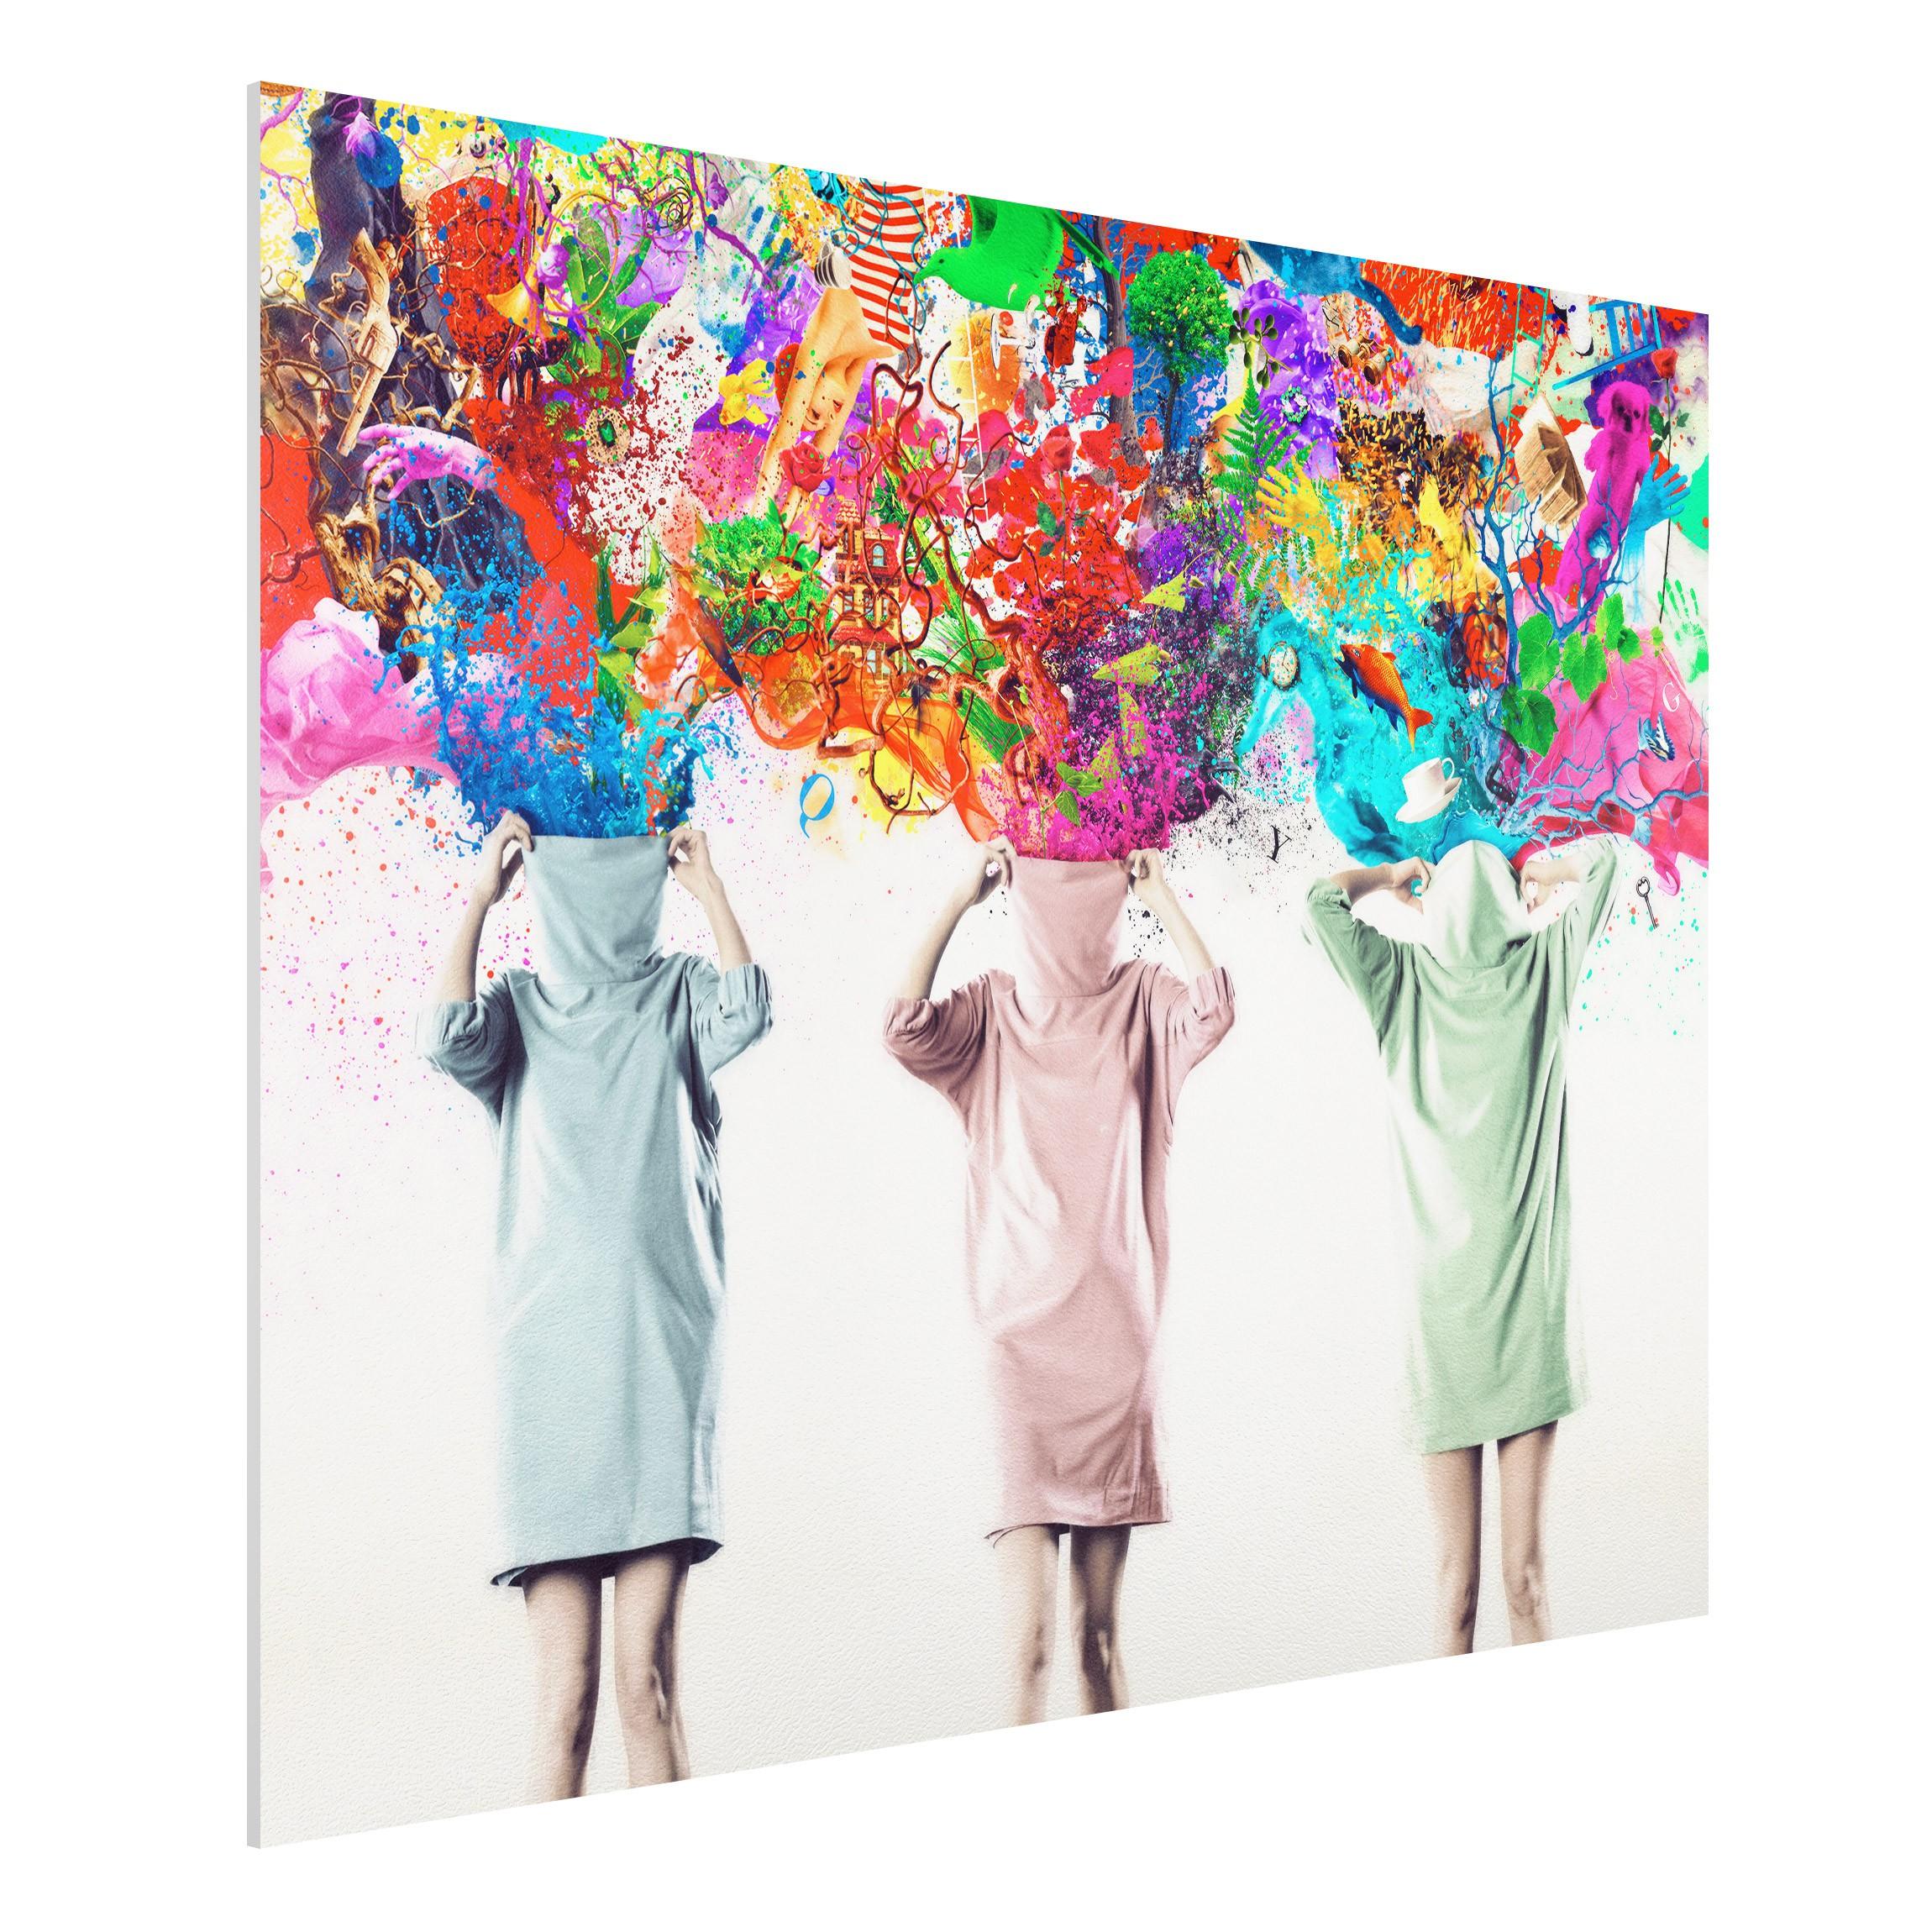 forex fine art print mural brain explosions wide 3 4. Black Bedroom Furniture Sets. Home Design Ideas